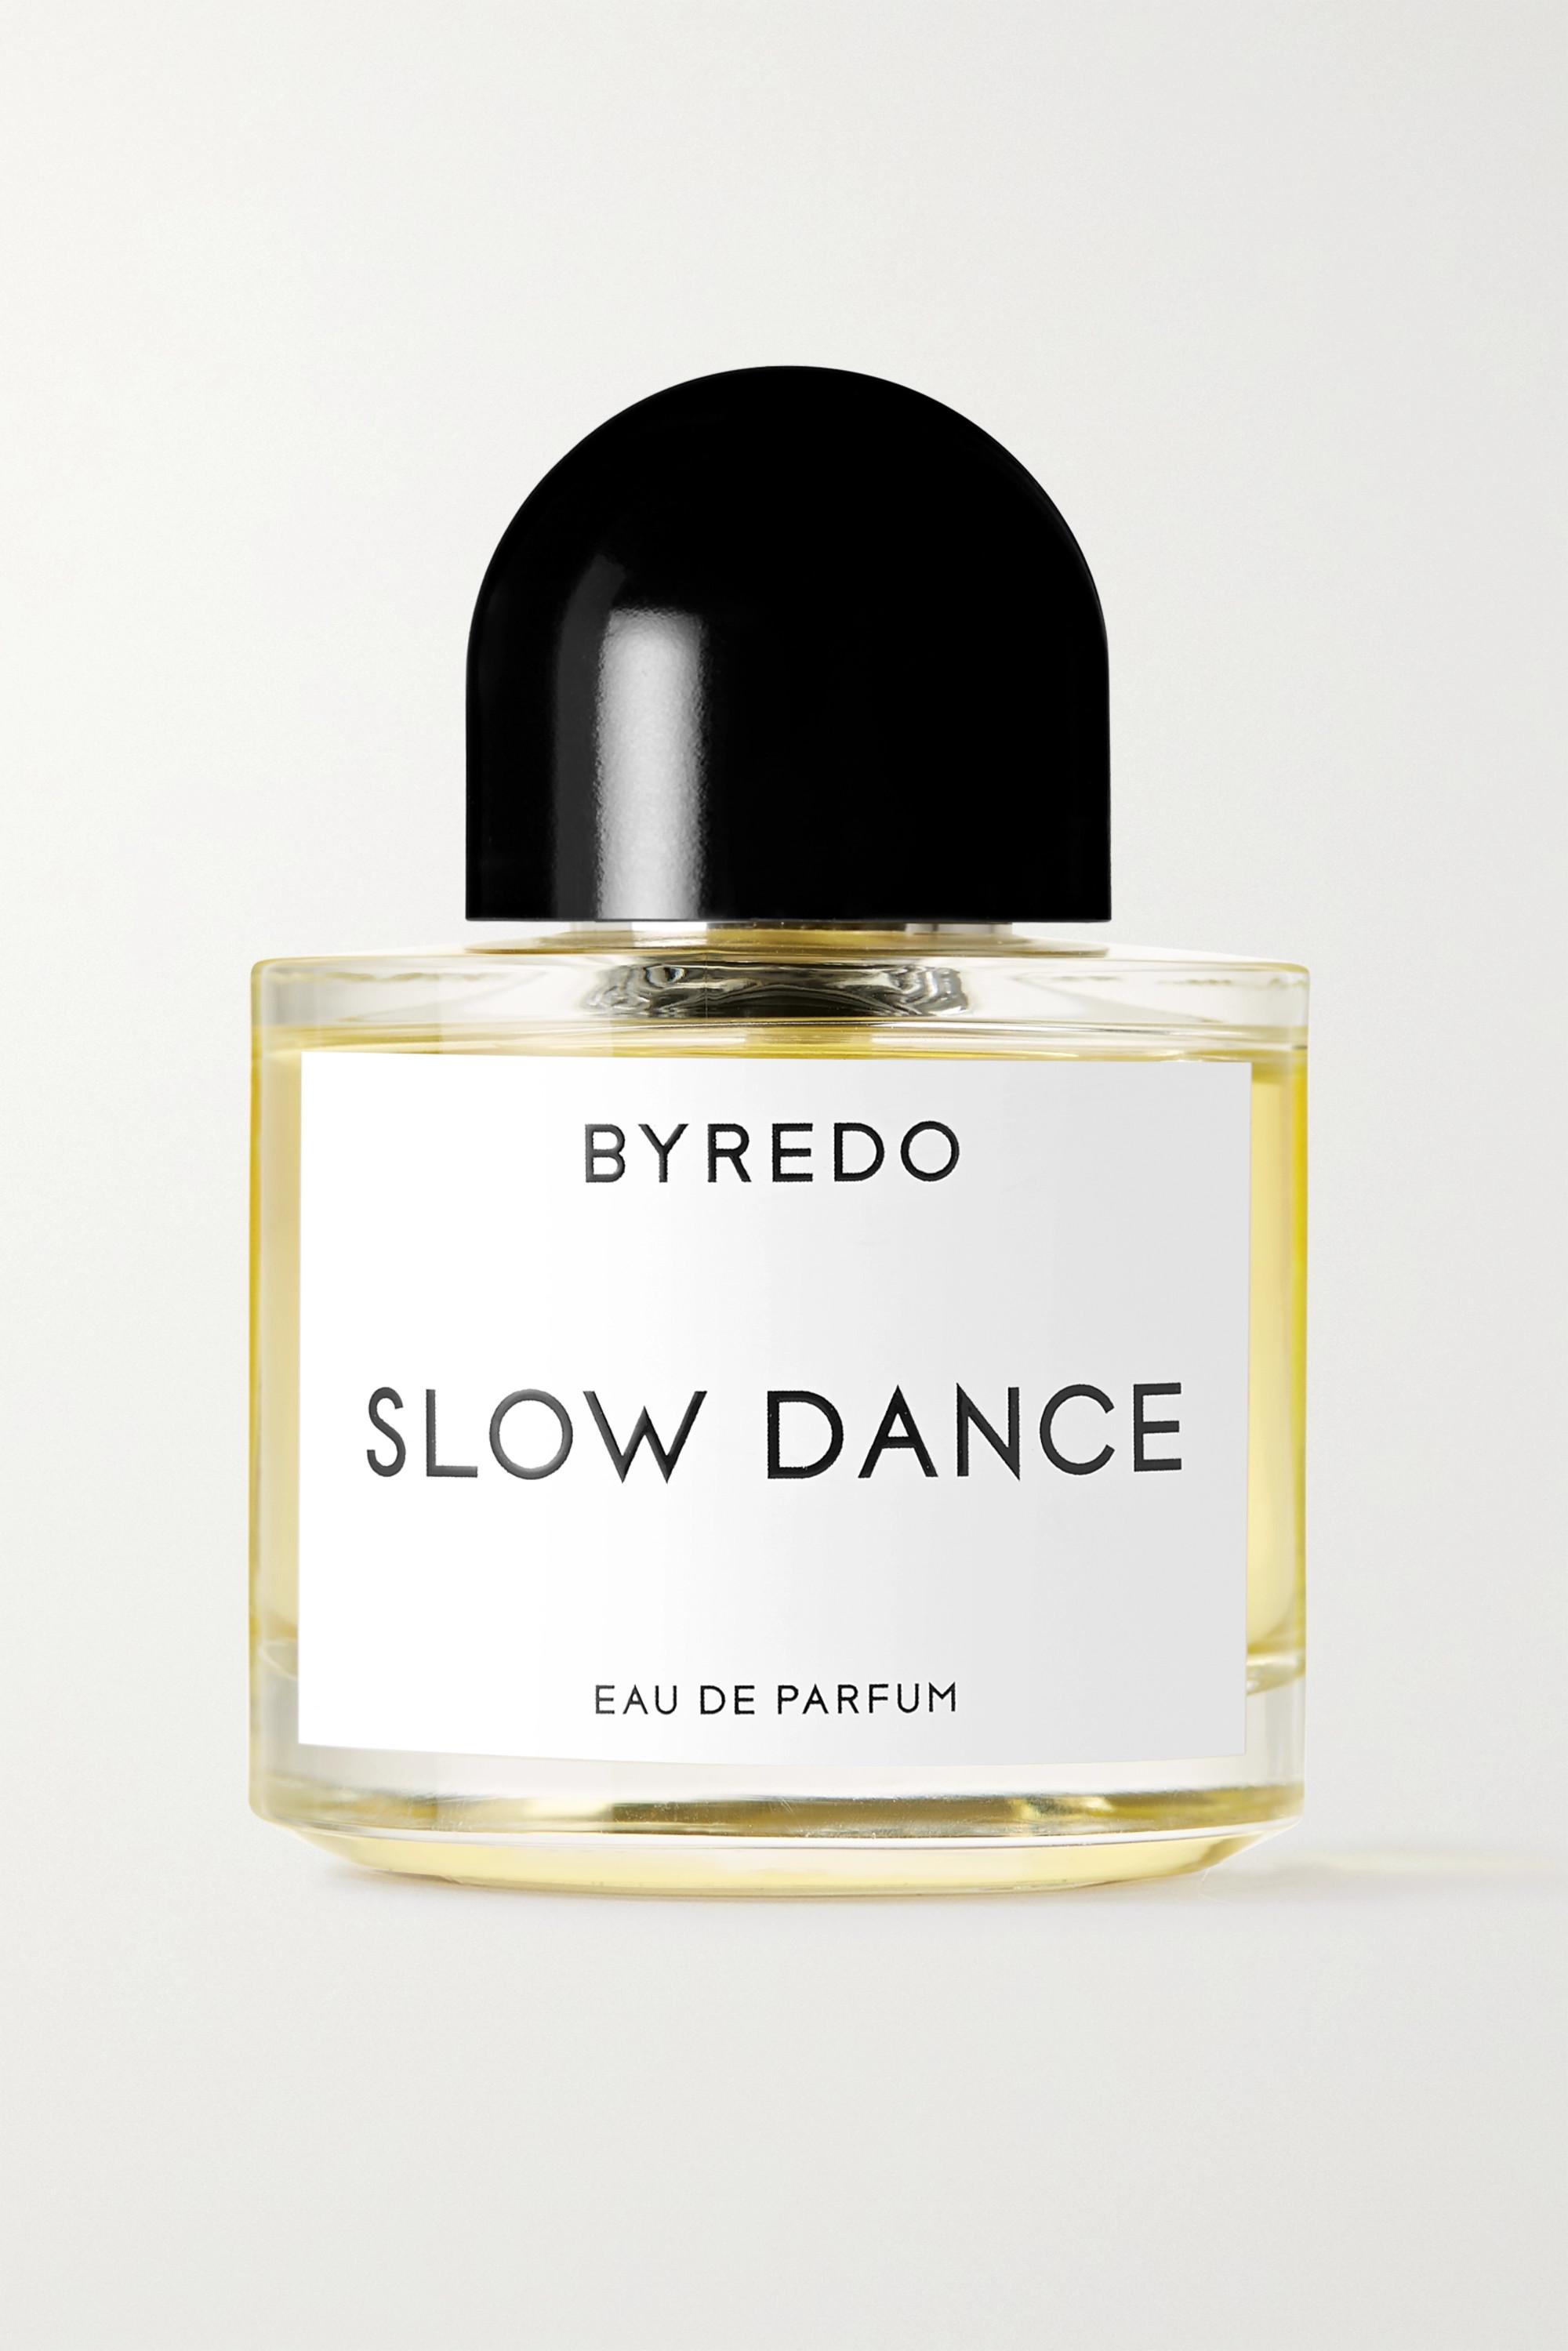 Byredo Slow Dance Eau de Parfum - Opoponax, Geranium & Vanilla, 50ml